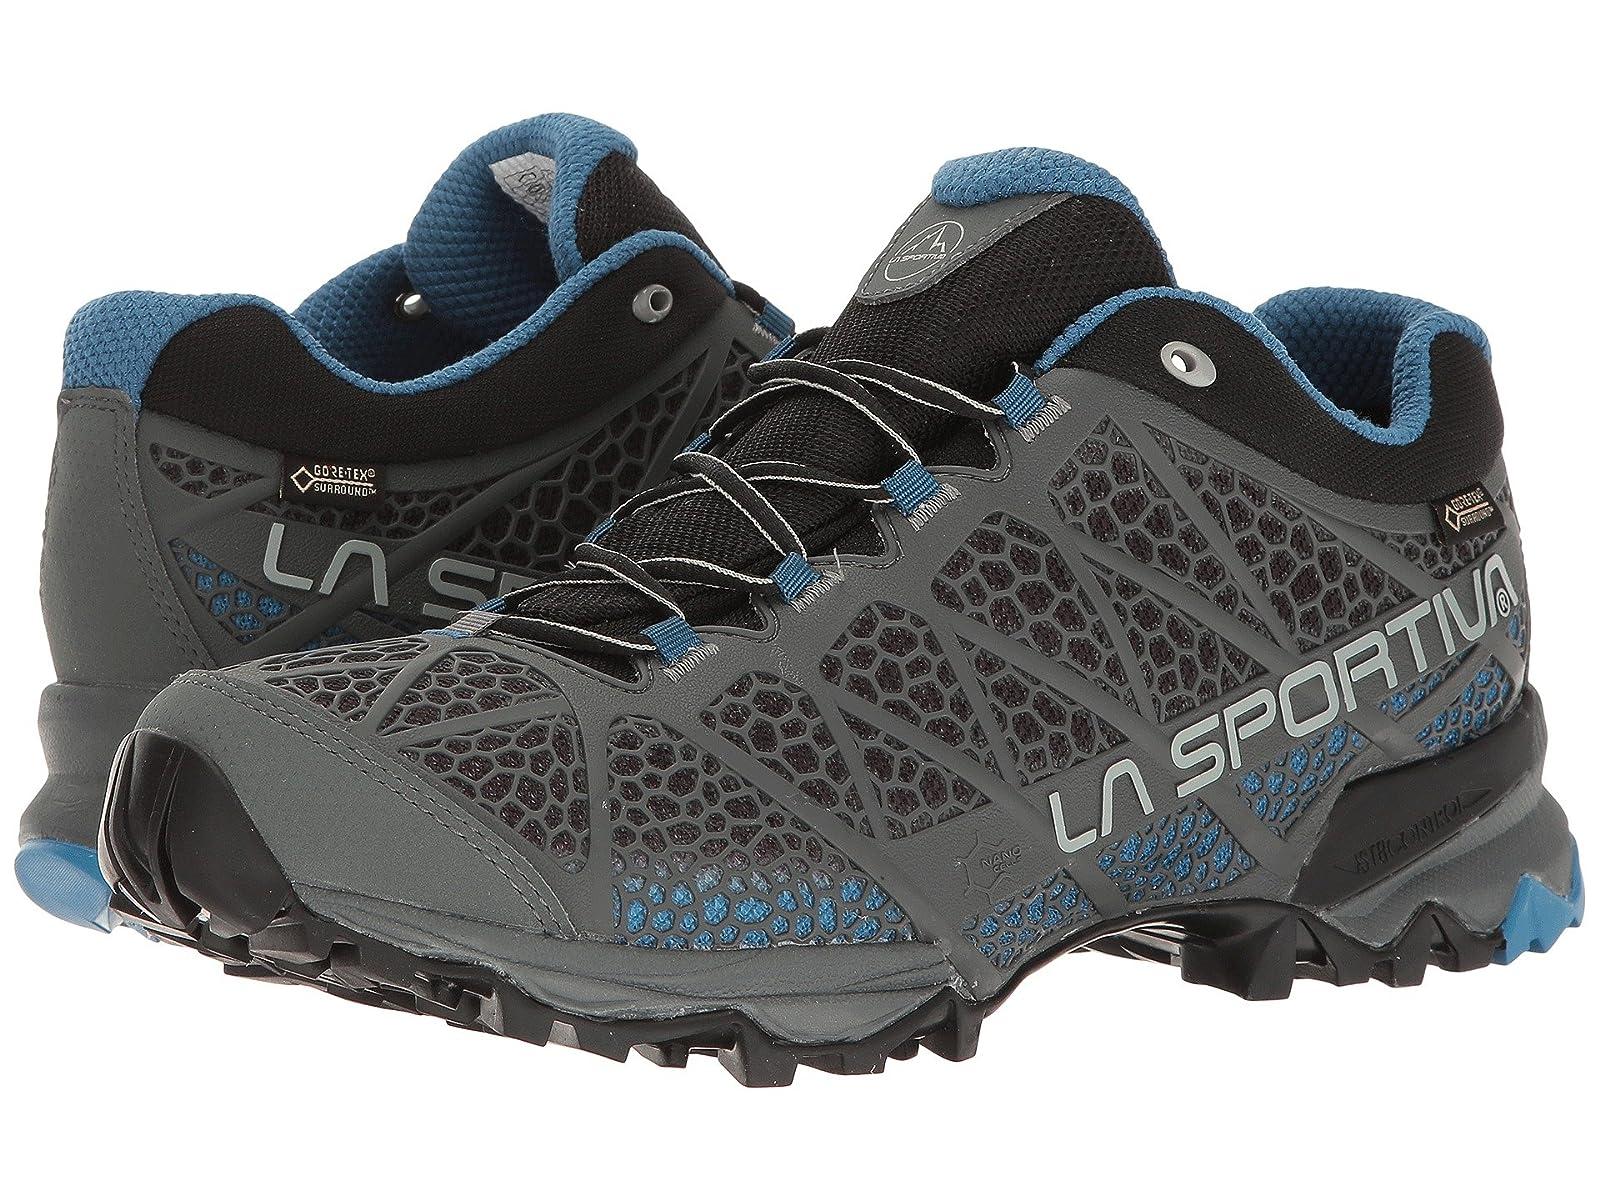 La Sportiva Primer Low GTXCheap and distinctive eye-catching shoes